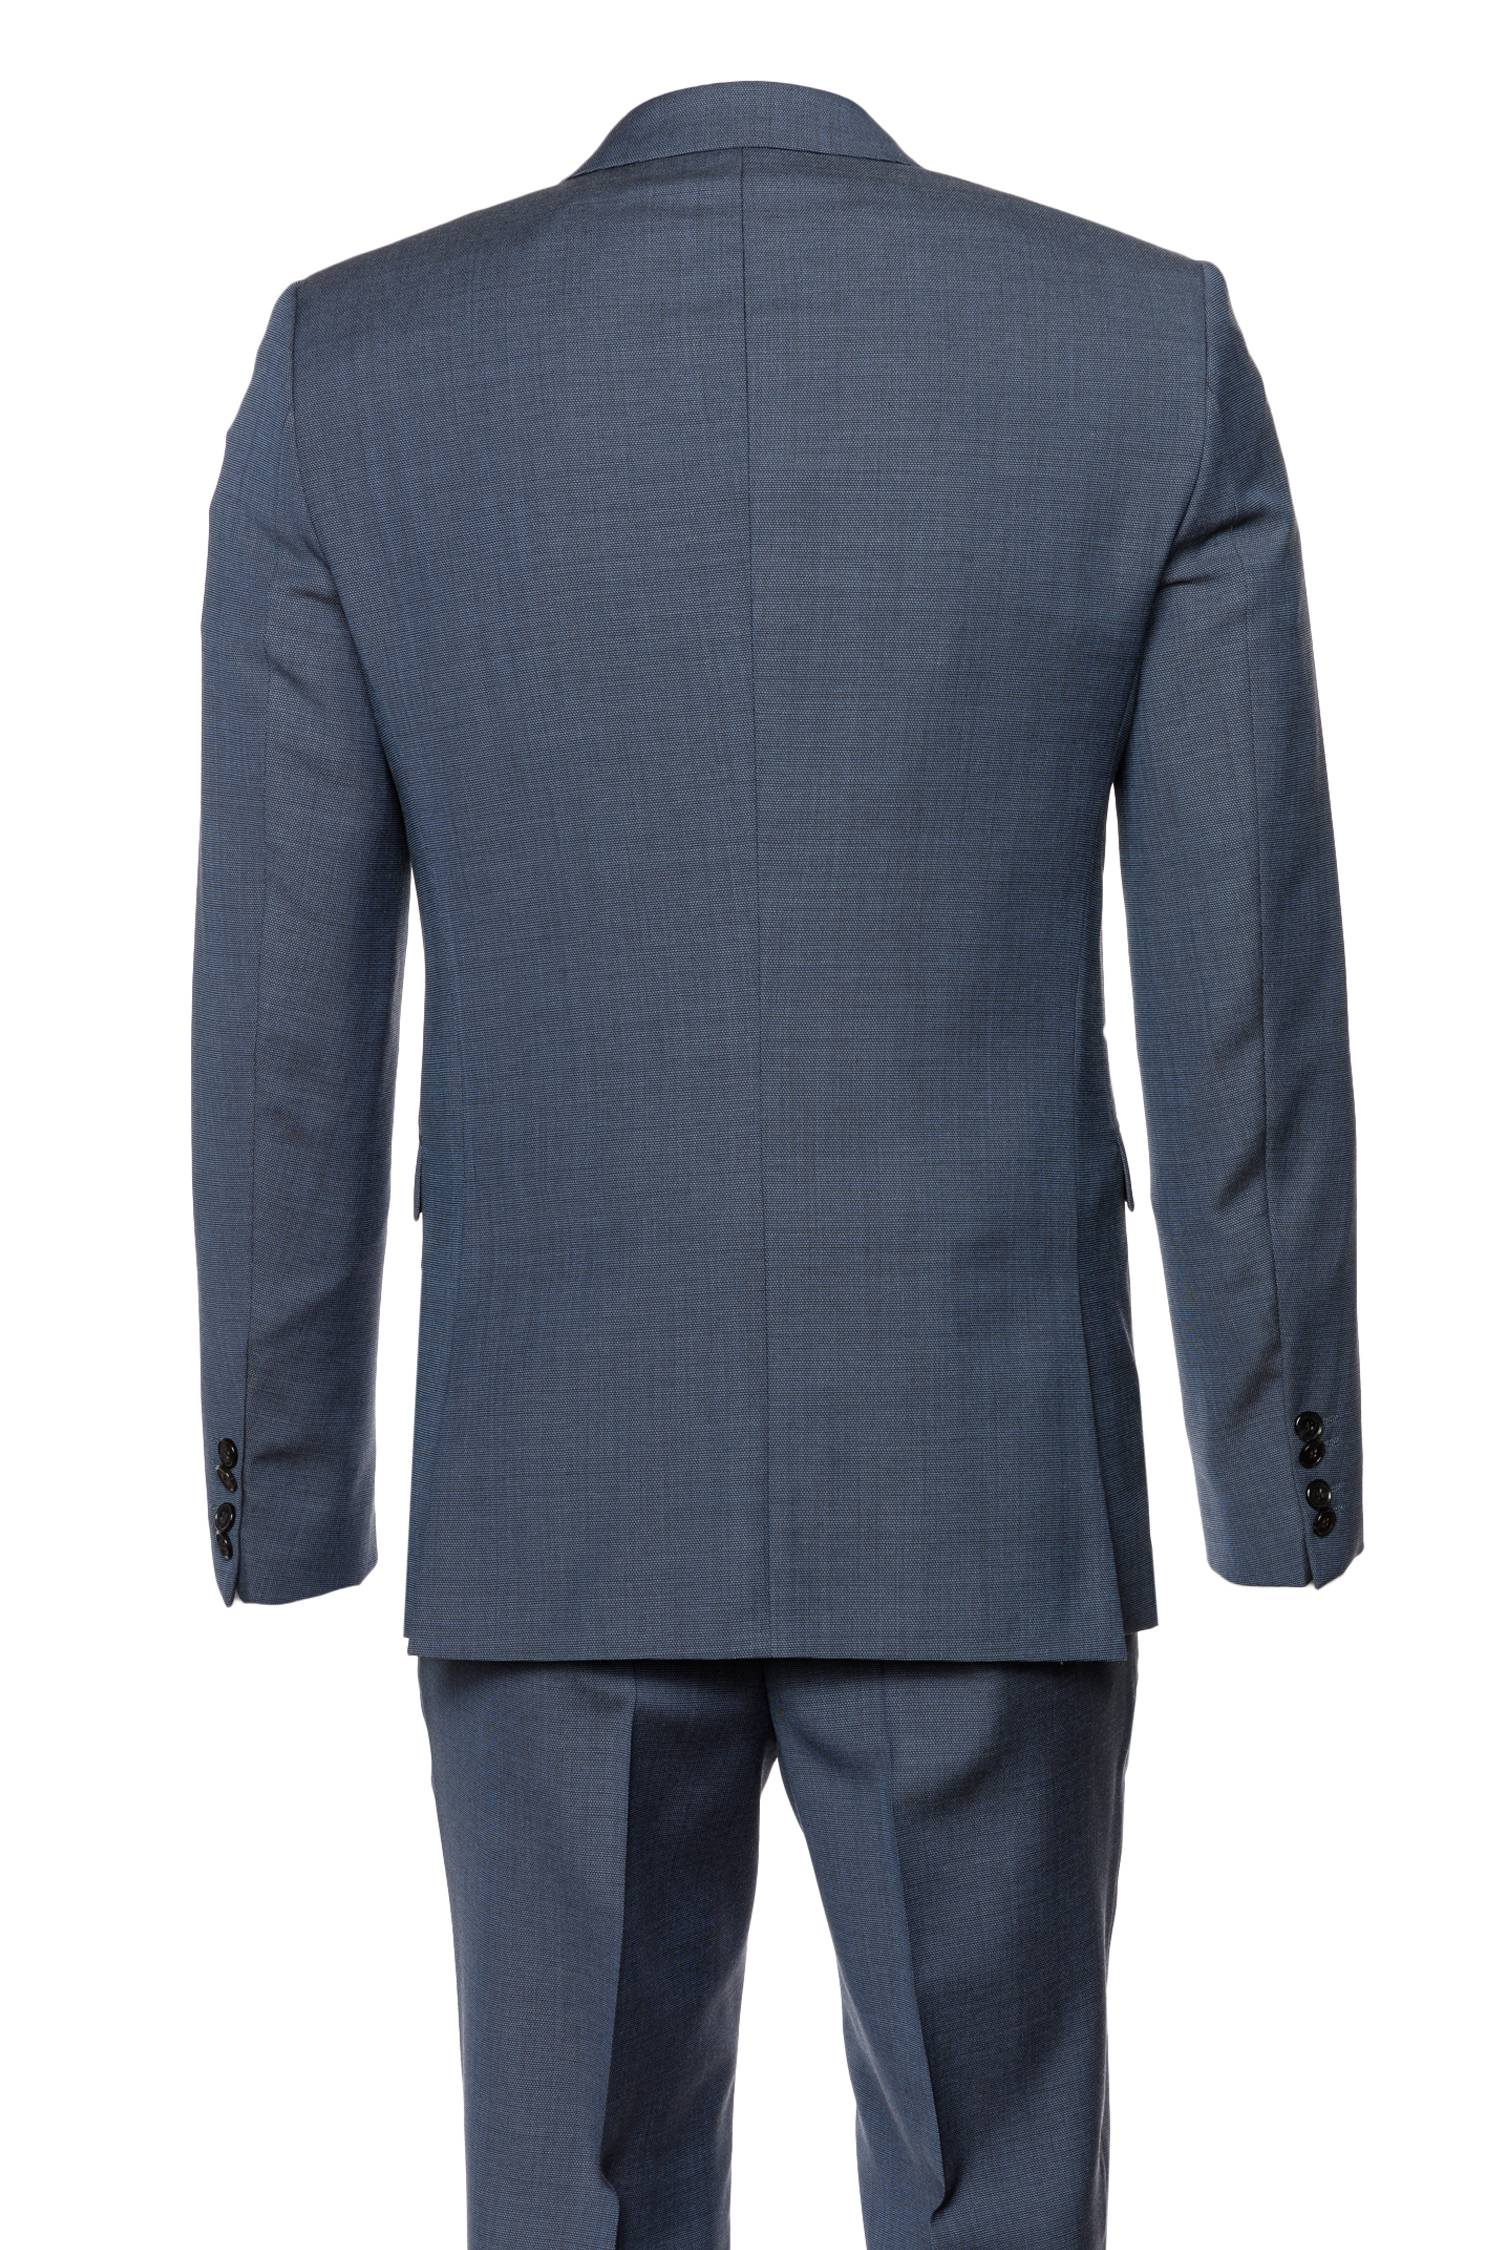 ba5ba965b792 HUGO Herren Business Anzug Modell Astian Hets 184 Karo Flatfront   eBay